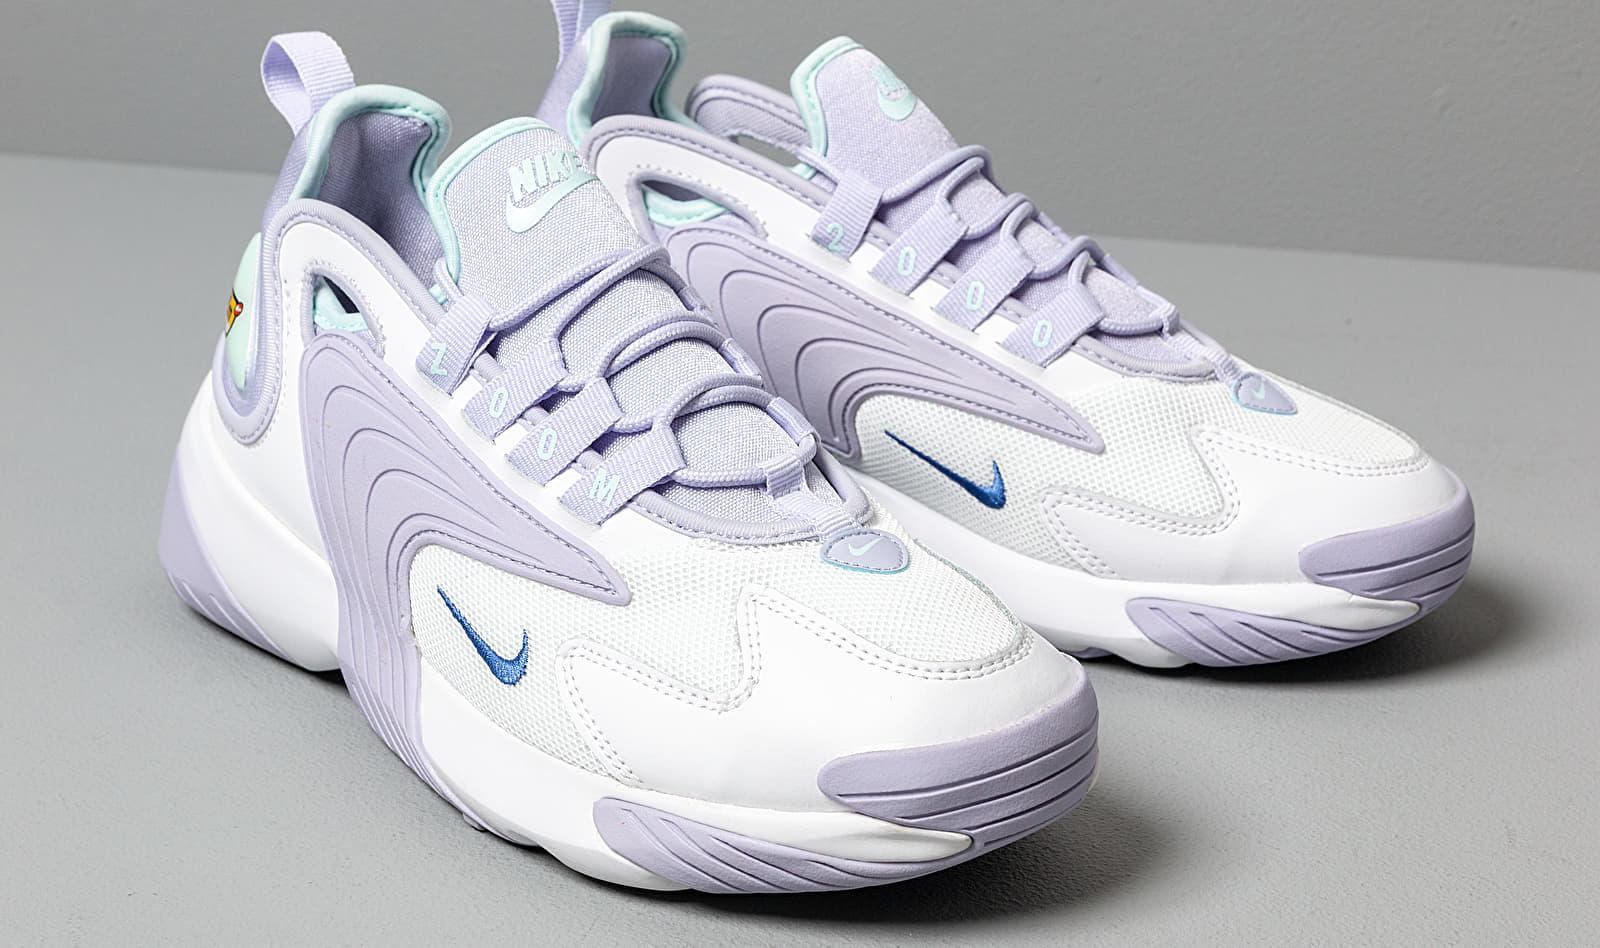 Sneakers | ZOOM 2K WhiteSapphireOxygen PurpleTeal Tint